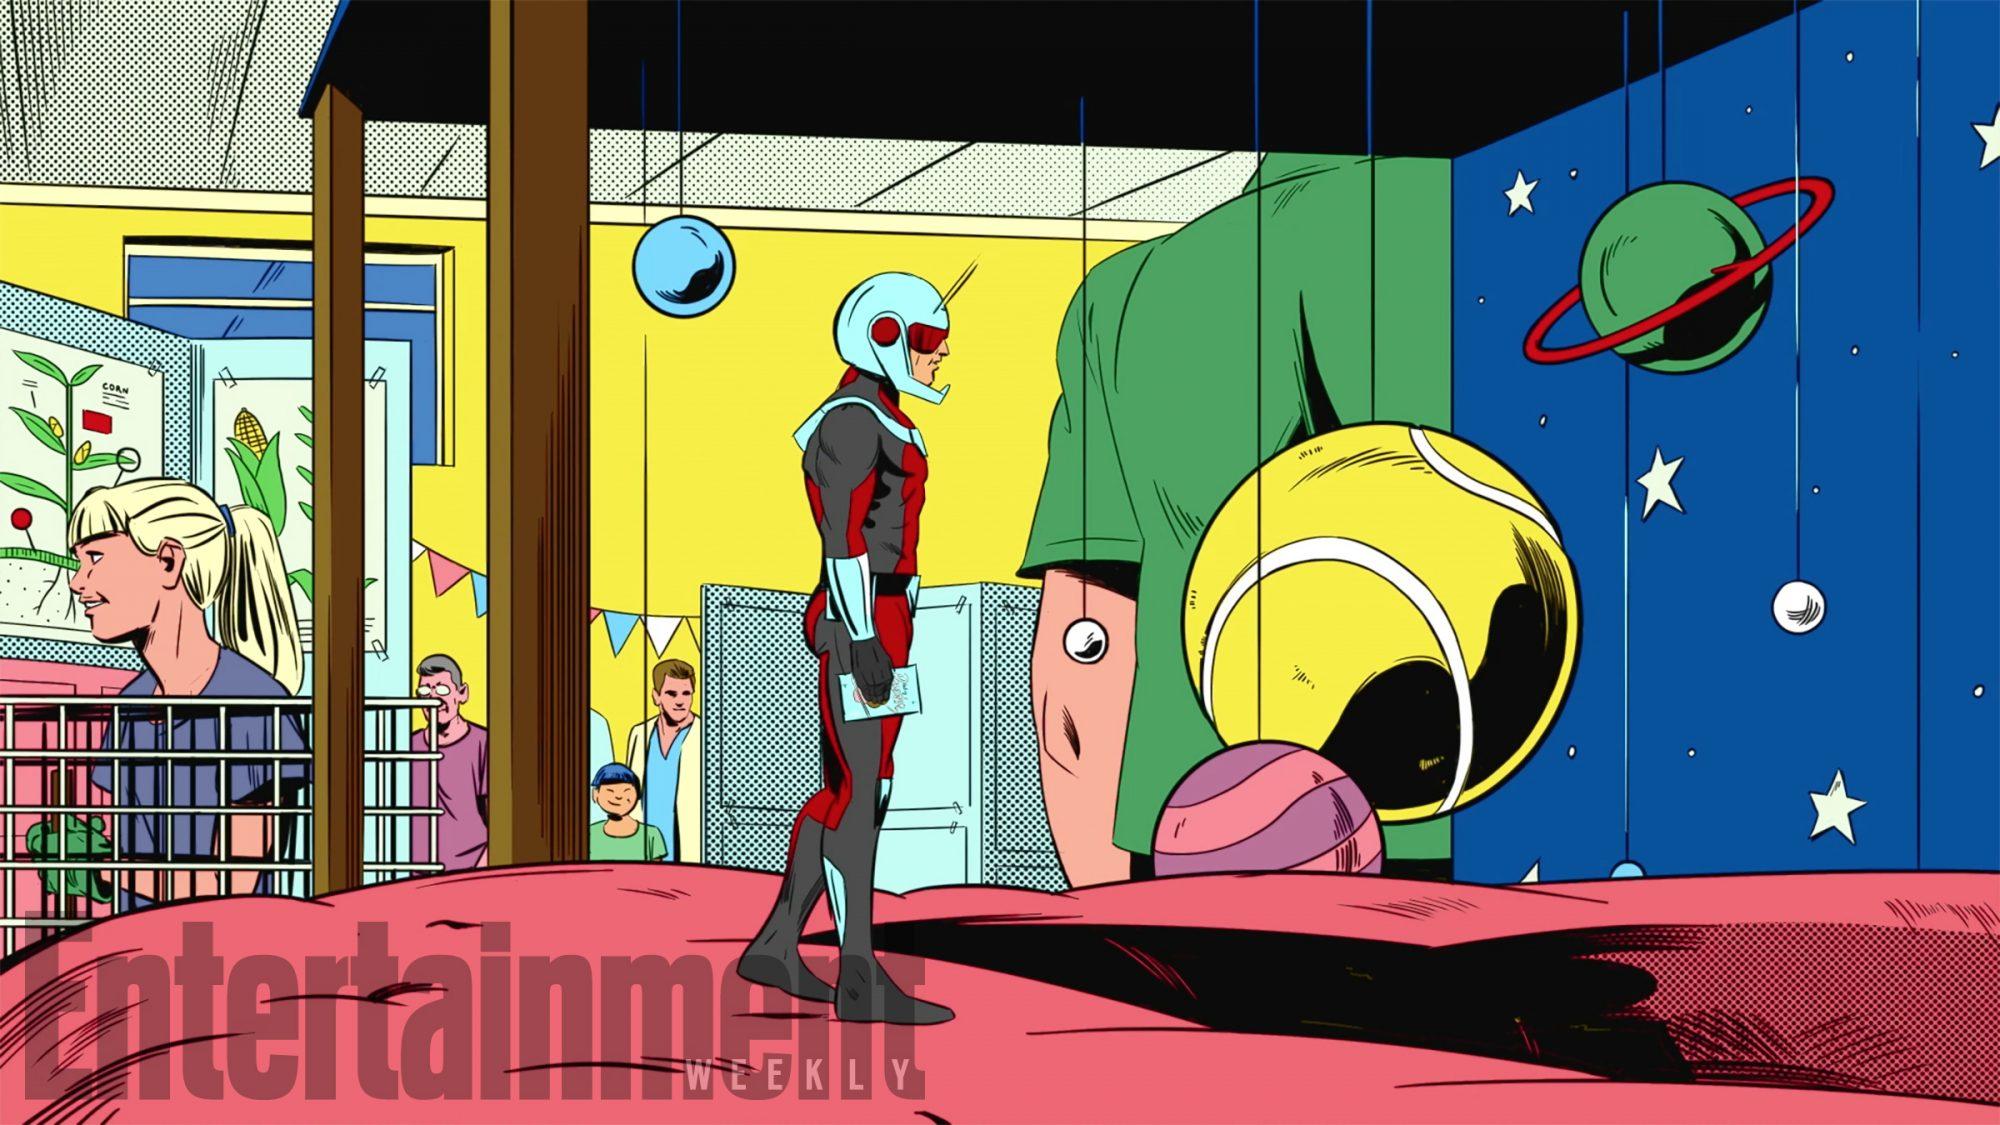 Marvel's Ant Man